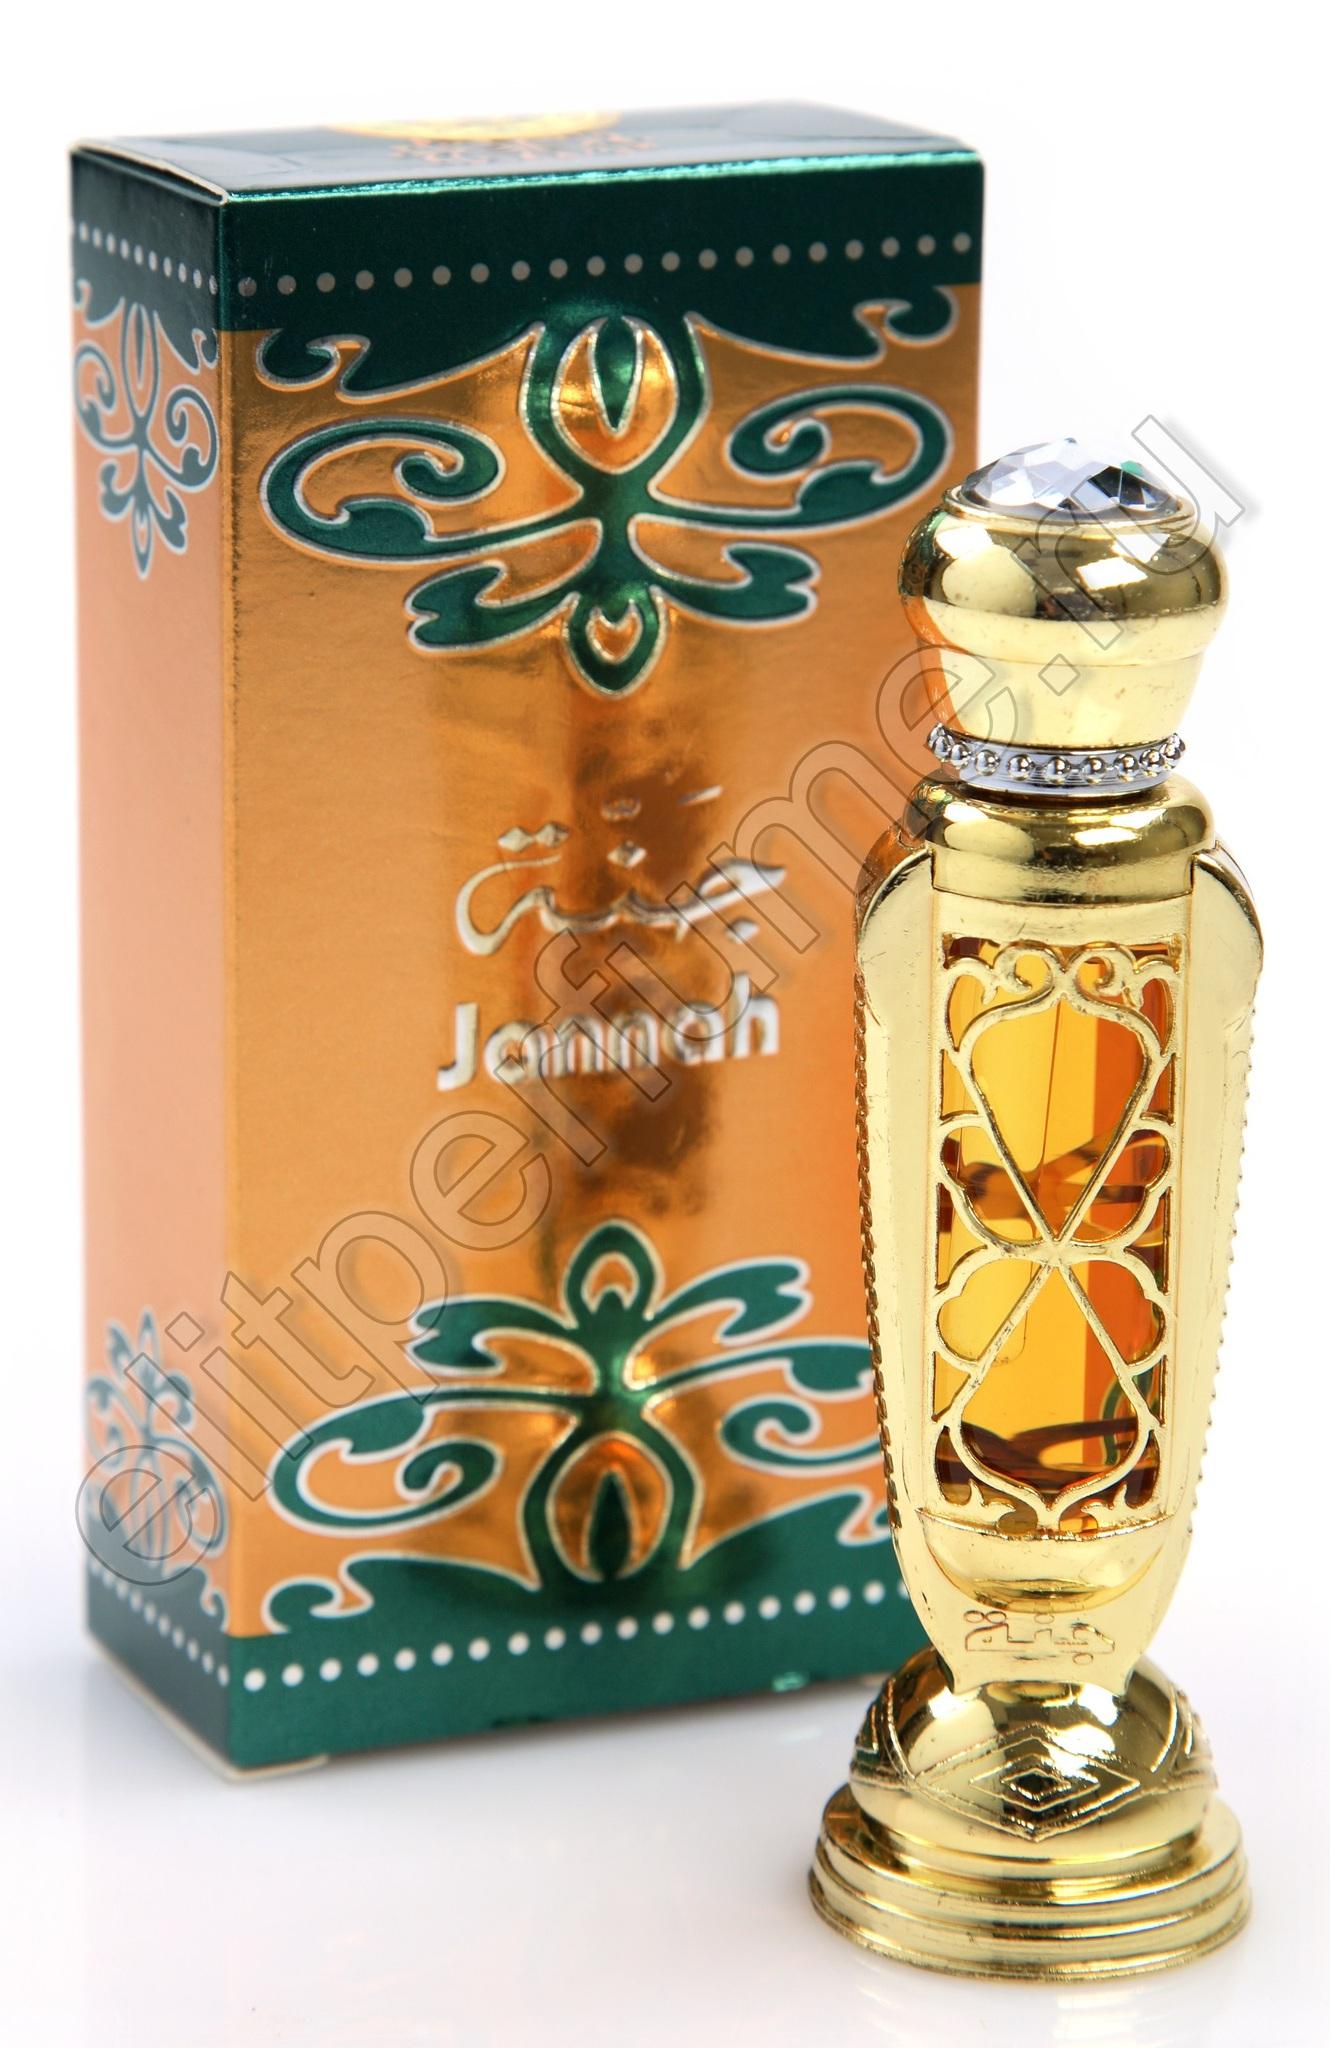 Пробники для духов Джанна Jannah 1 мл арабские масляные духи от Аль Харамайн Al Haramin Perfumes